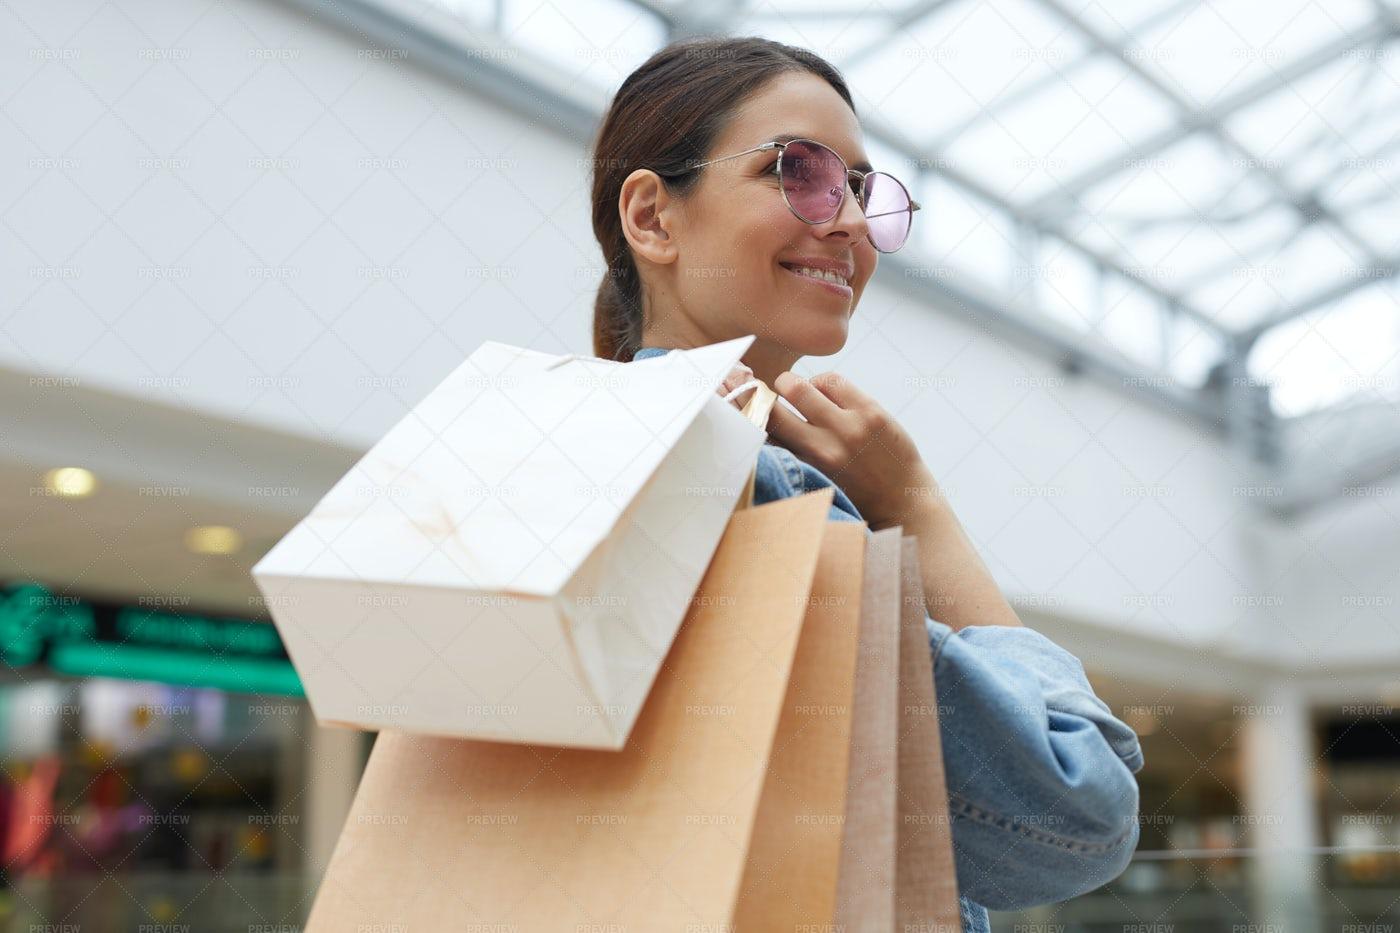 Girl Enjoying Shopping: Stock Photos